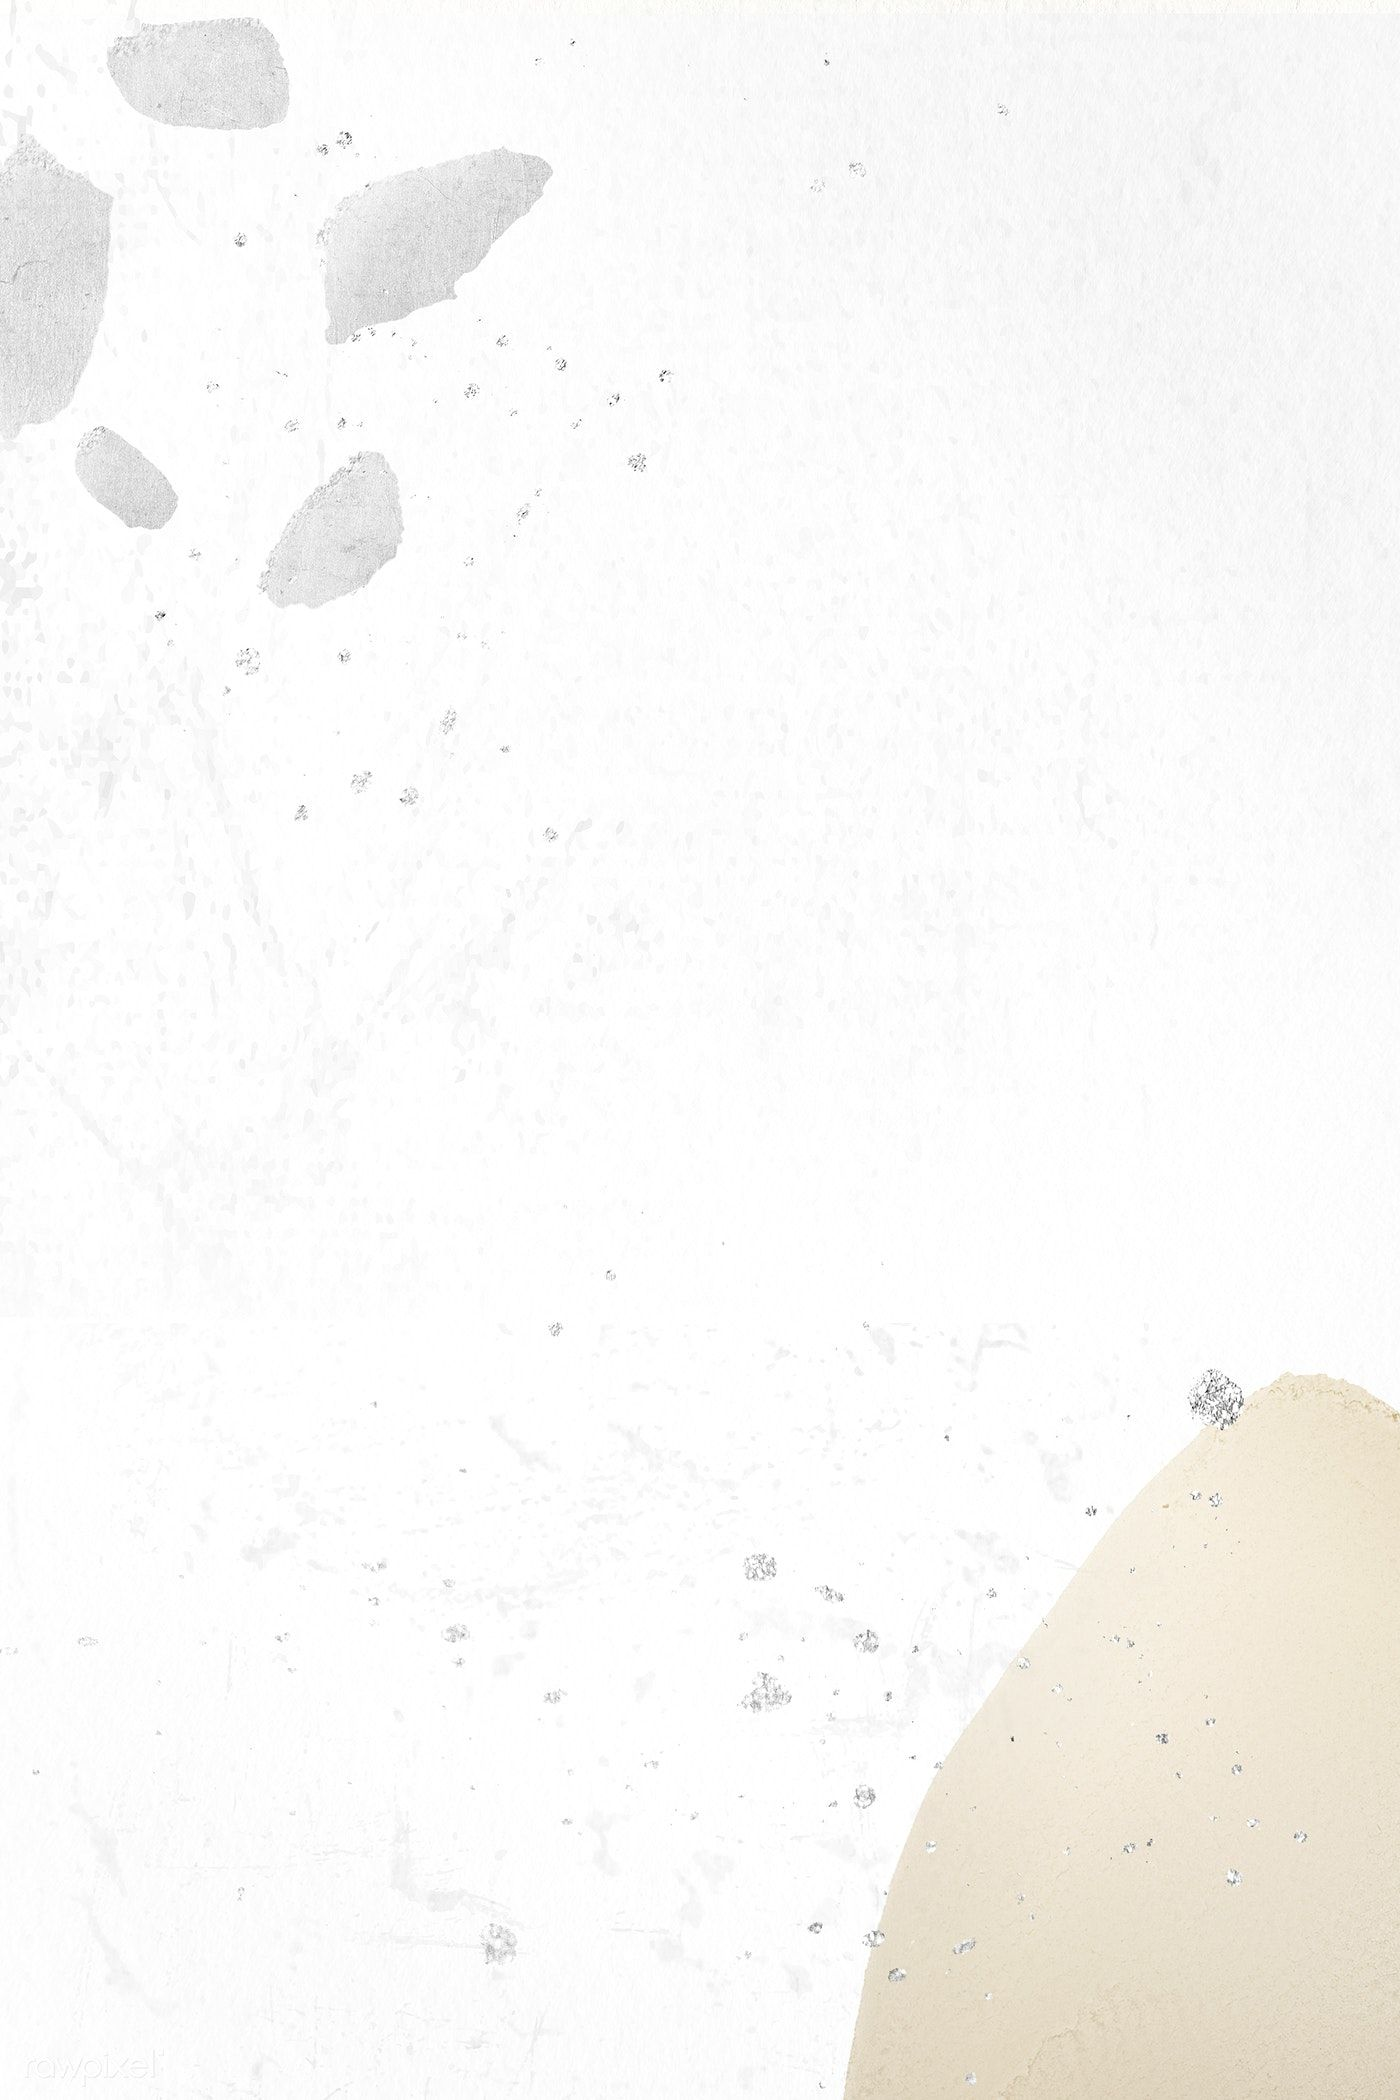 White Tone Neo Memphis Social Background Mockup Premium Image By Rawpixel Com Hwangmangjoo Wallpaper Ponsel Inspirasi Desain Grafis Latar Belakang